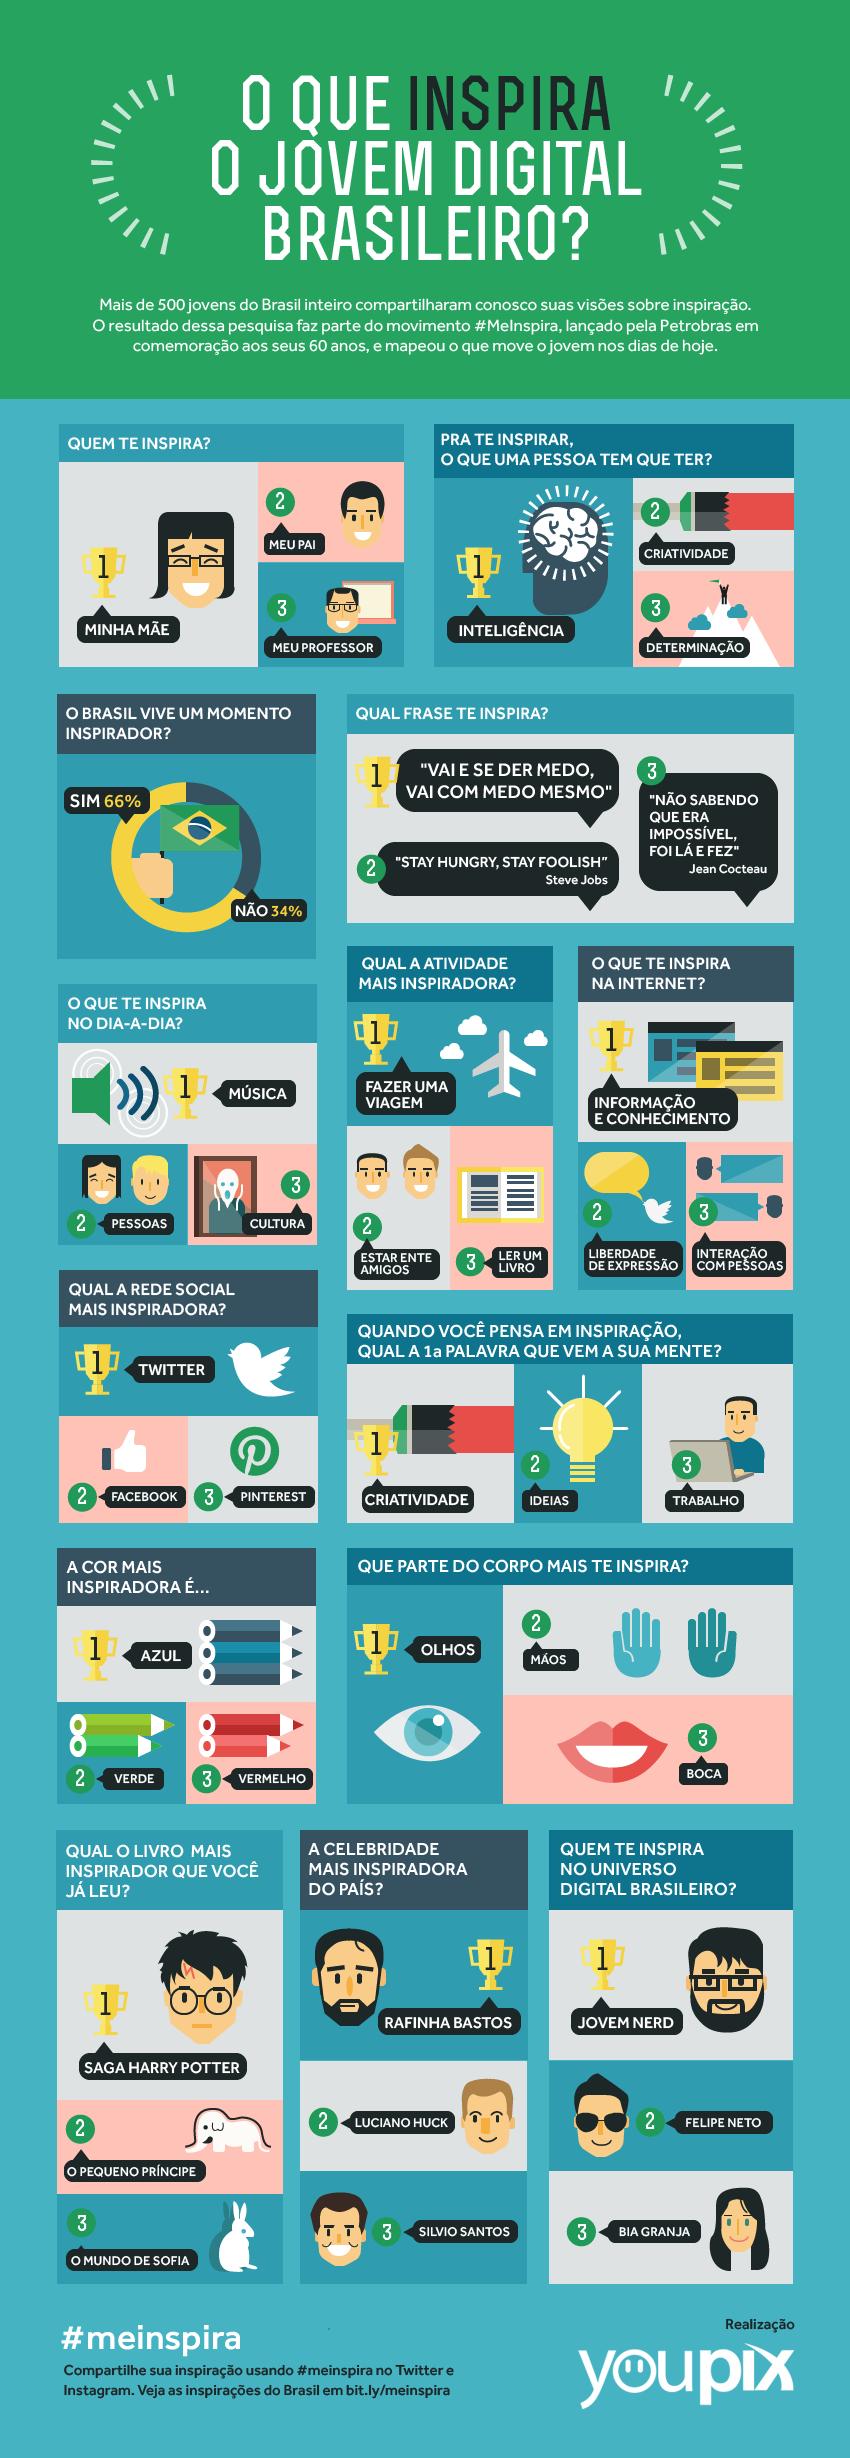 infografico_oqueinspiraojovemdigital_meinspira